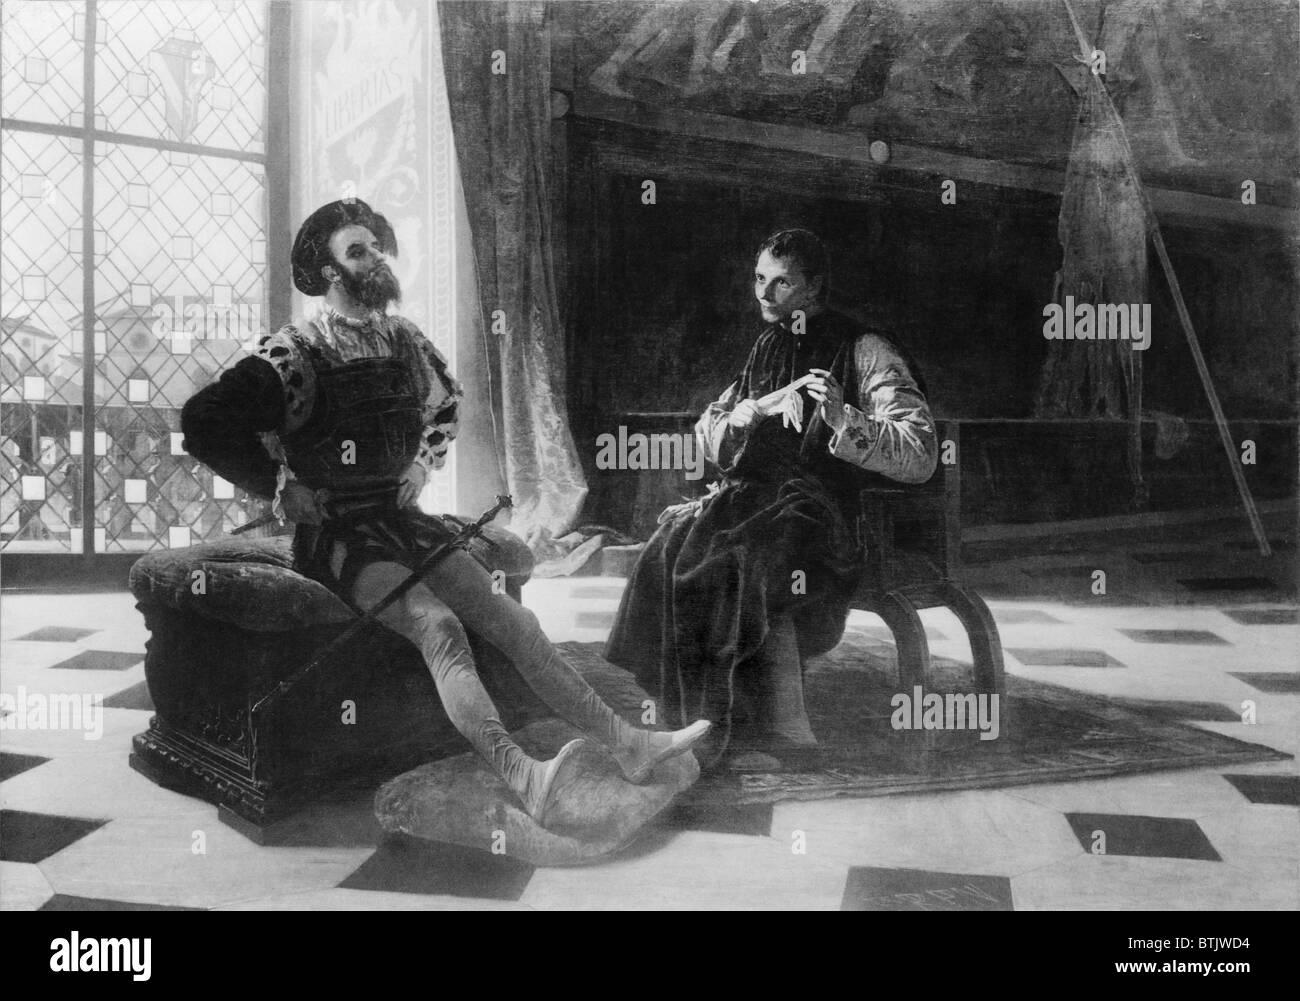 Niccoló Machiavelli (1469-1527) in an imagined scene with Borgia, Cesare. Machiavelli held Borgia as an example Stock Photo